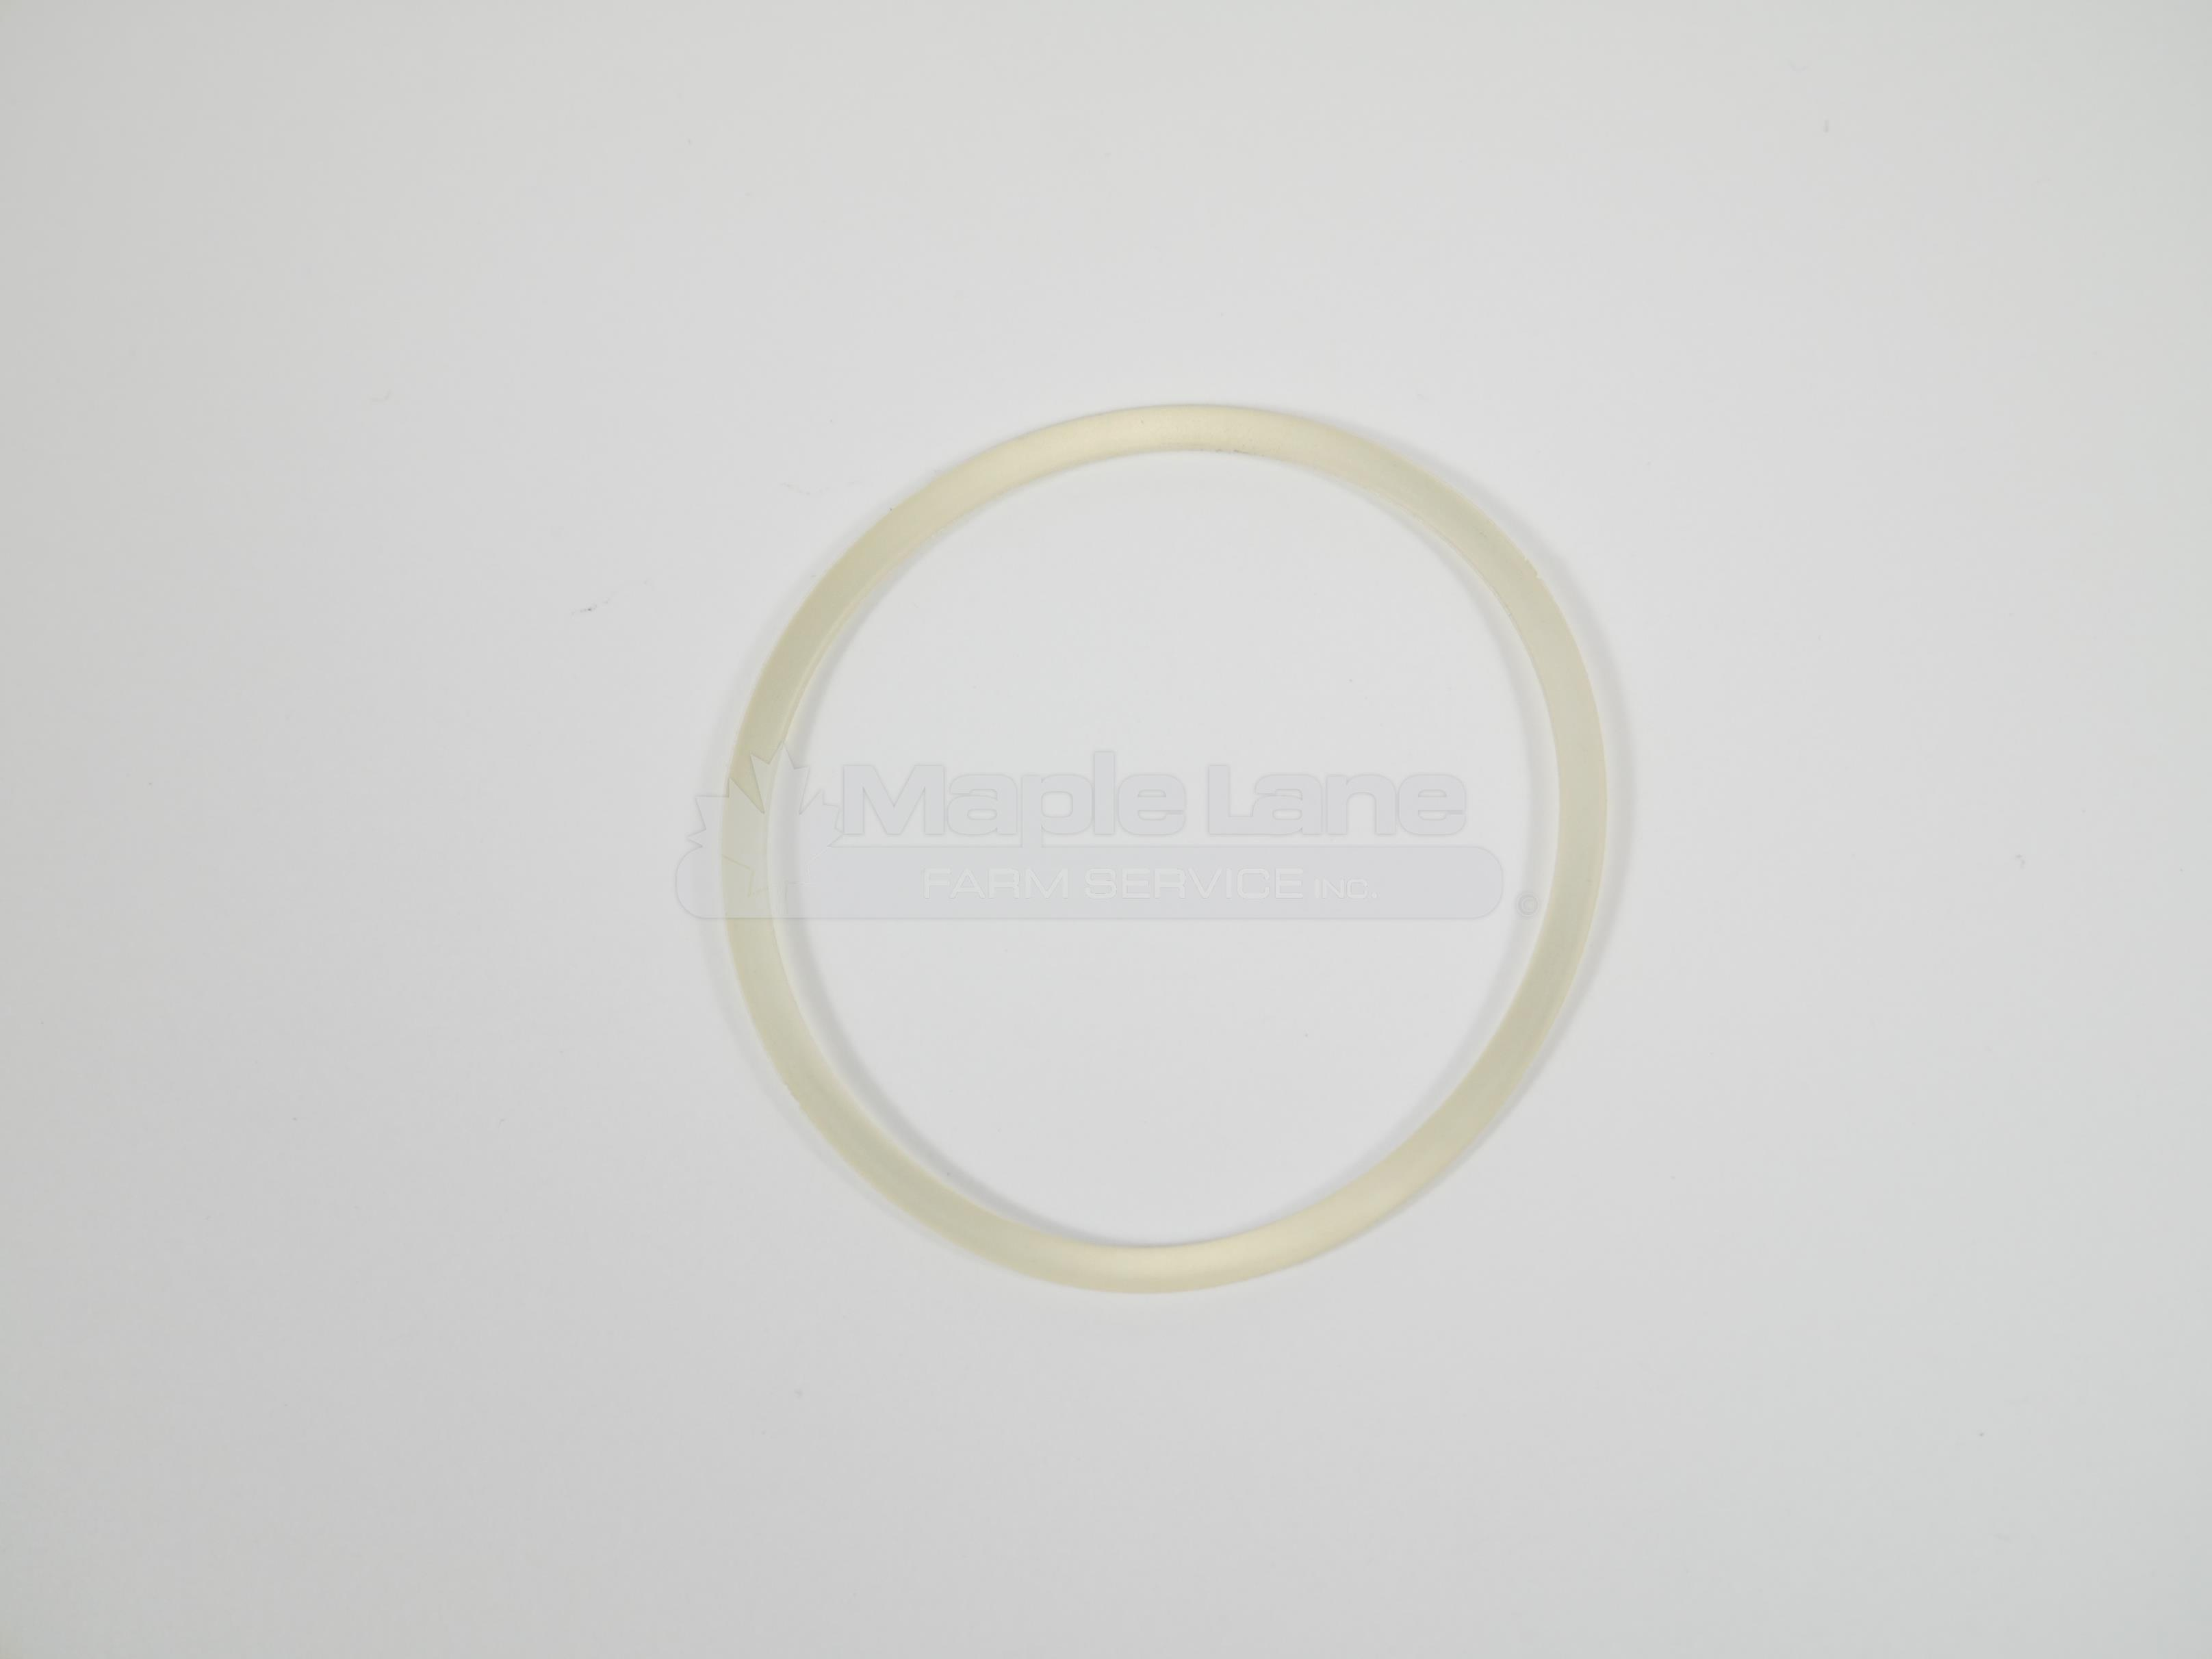 332205 O-Ring